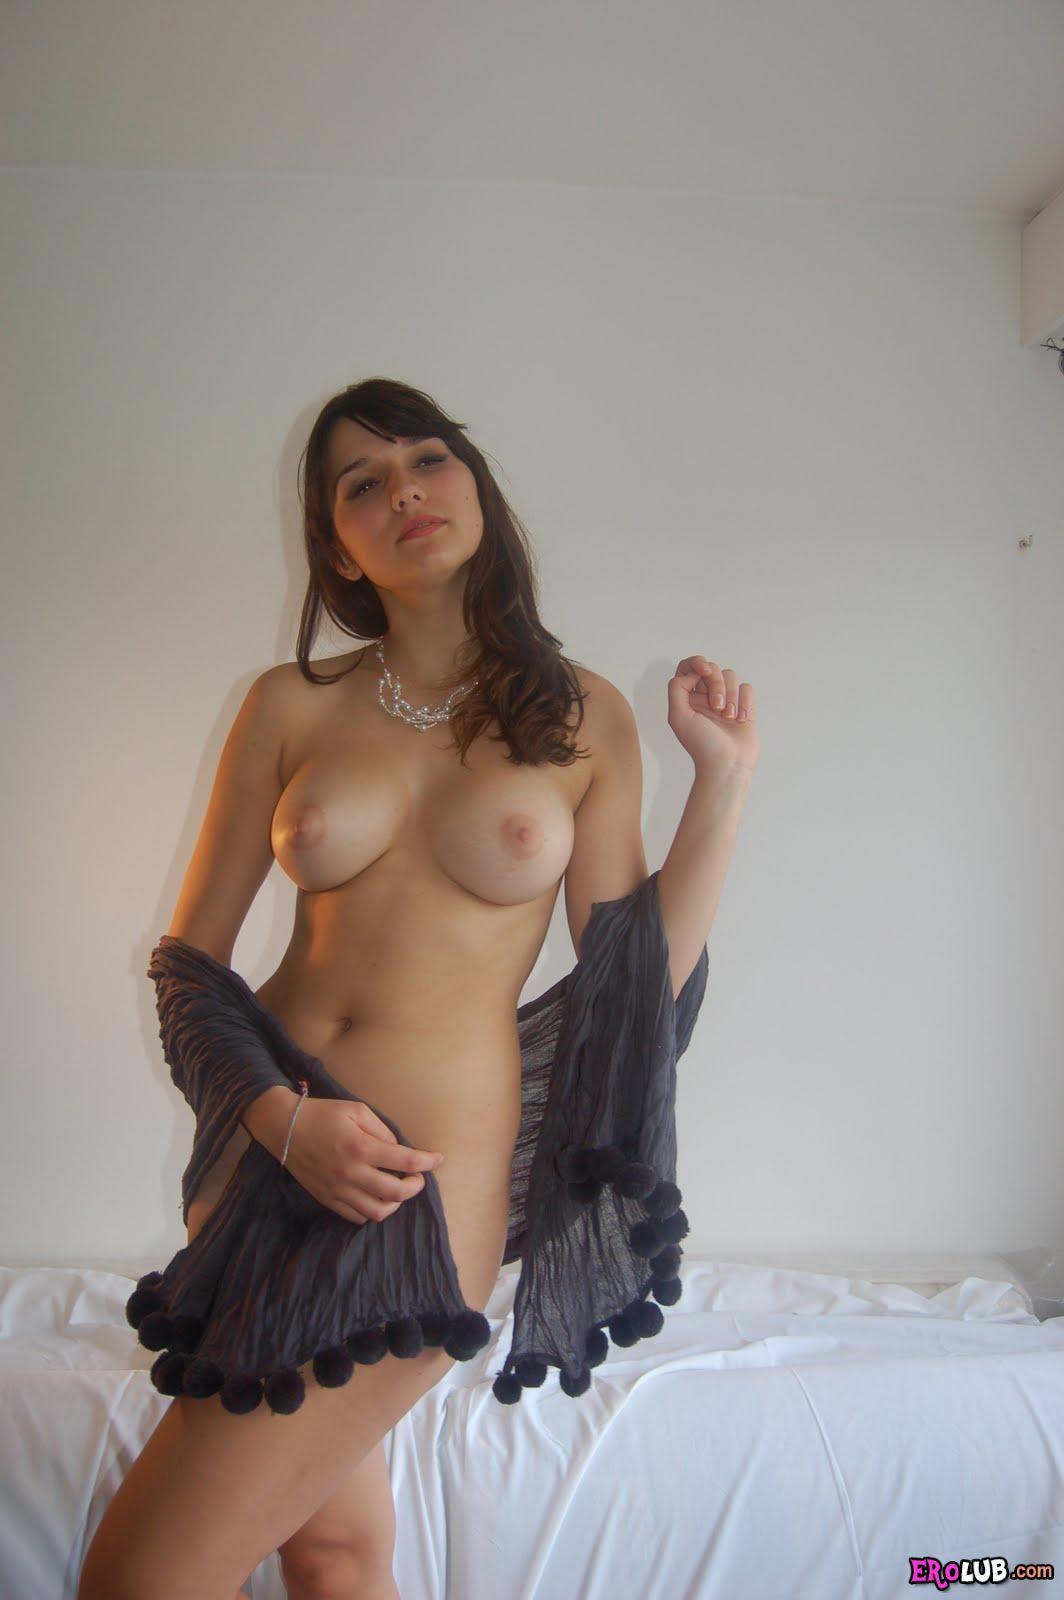 Девушки частная эротика фото 725-132